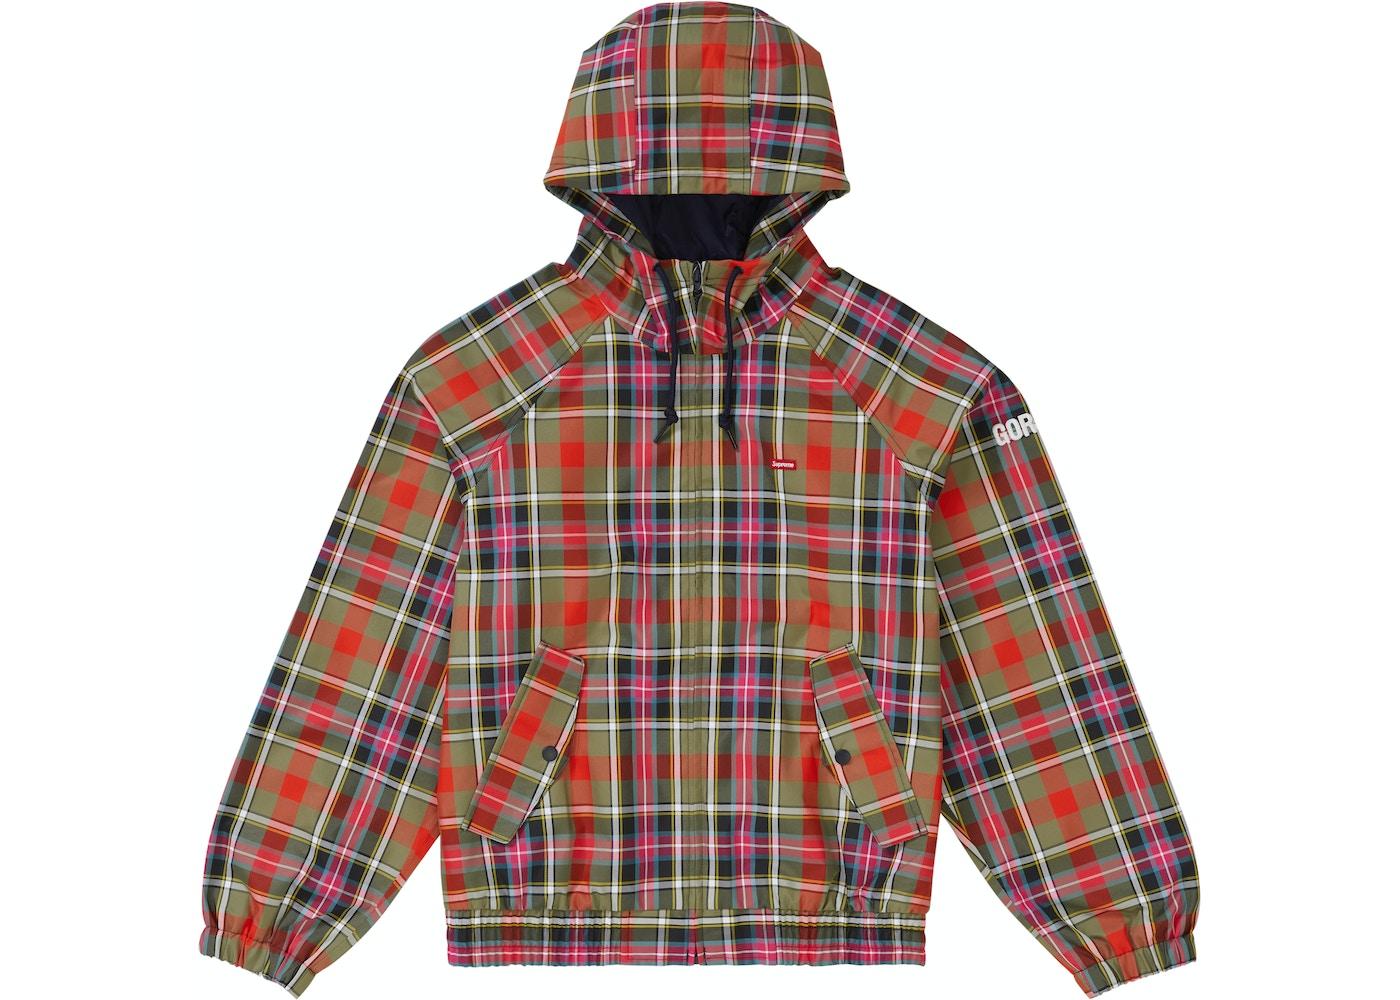 7bd05c2fd019 Supreme GORE-TEX Hooded Harrington Jacket Olive Plaid - SS19